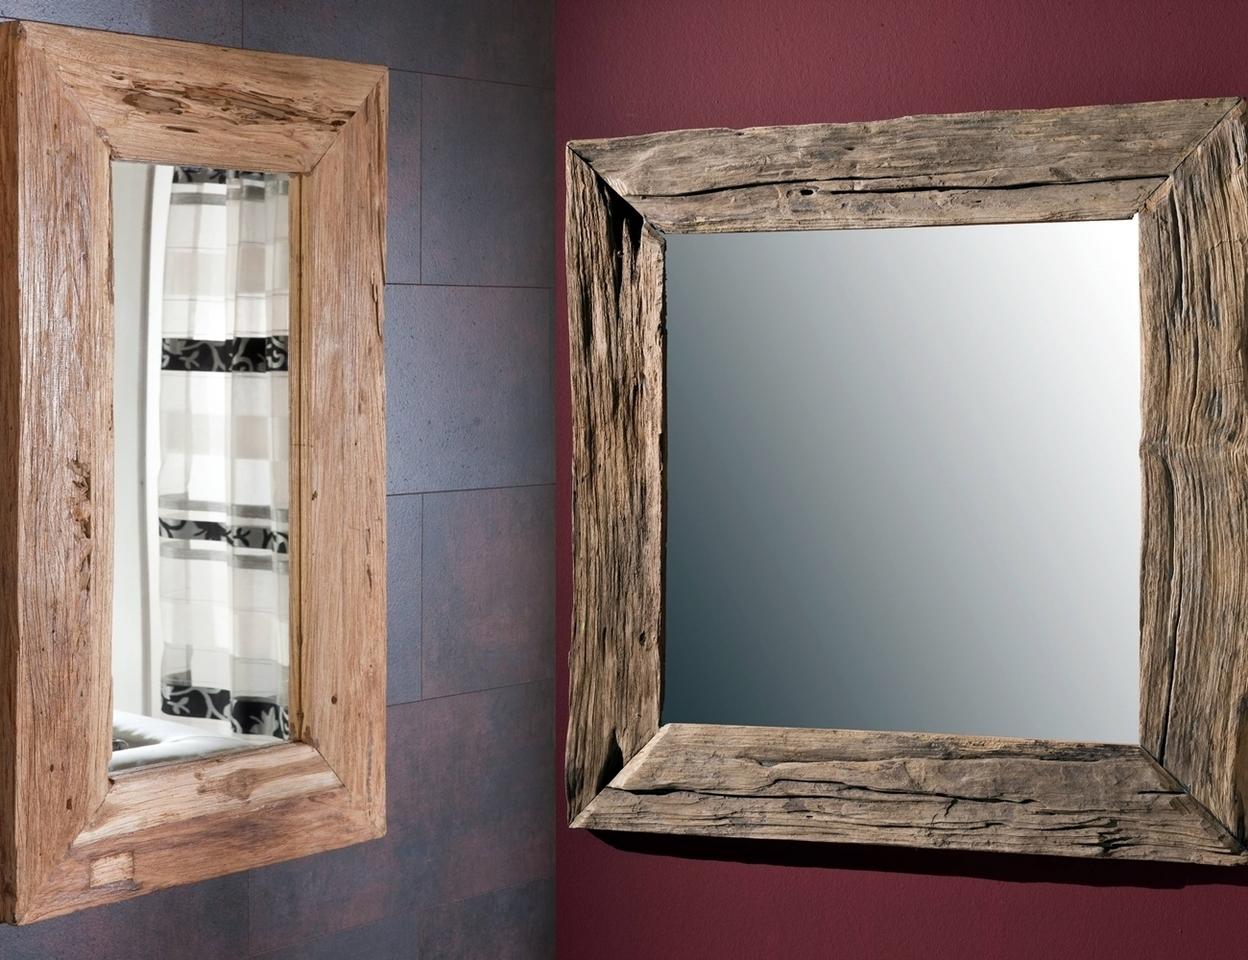 teakholz spiegel unikat von henke g nstig bestellen bei skanm bler. Black Bedroom Furniture Sets. Home Design Ideas